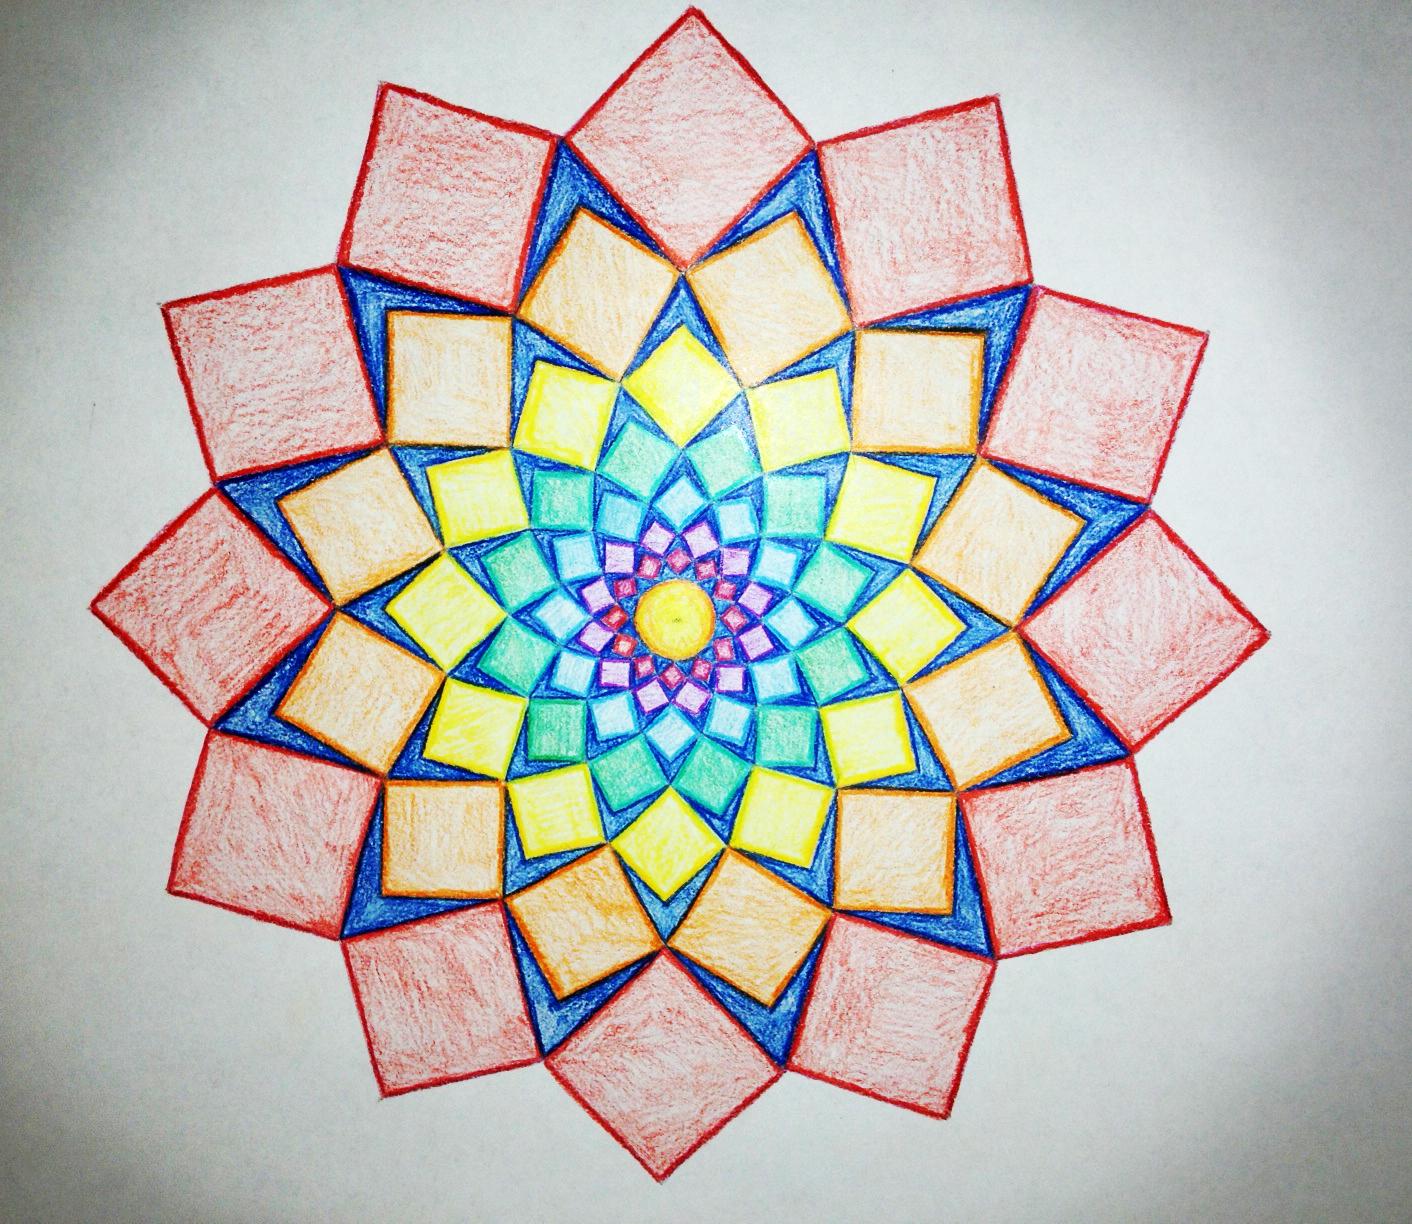 - Geometric Drawing and Principles, 6th Grade